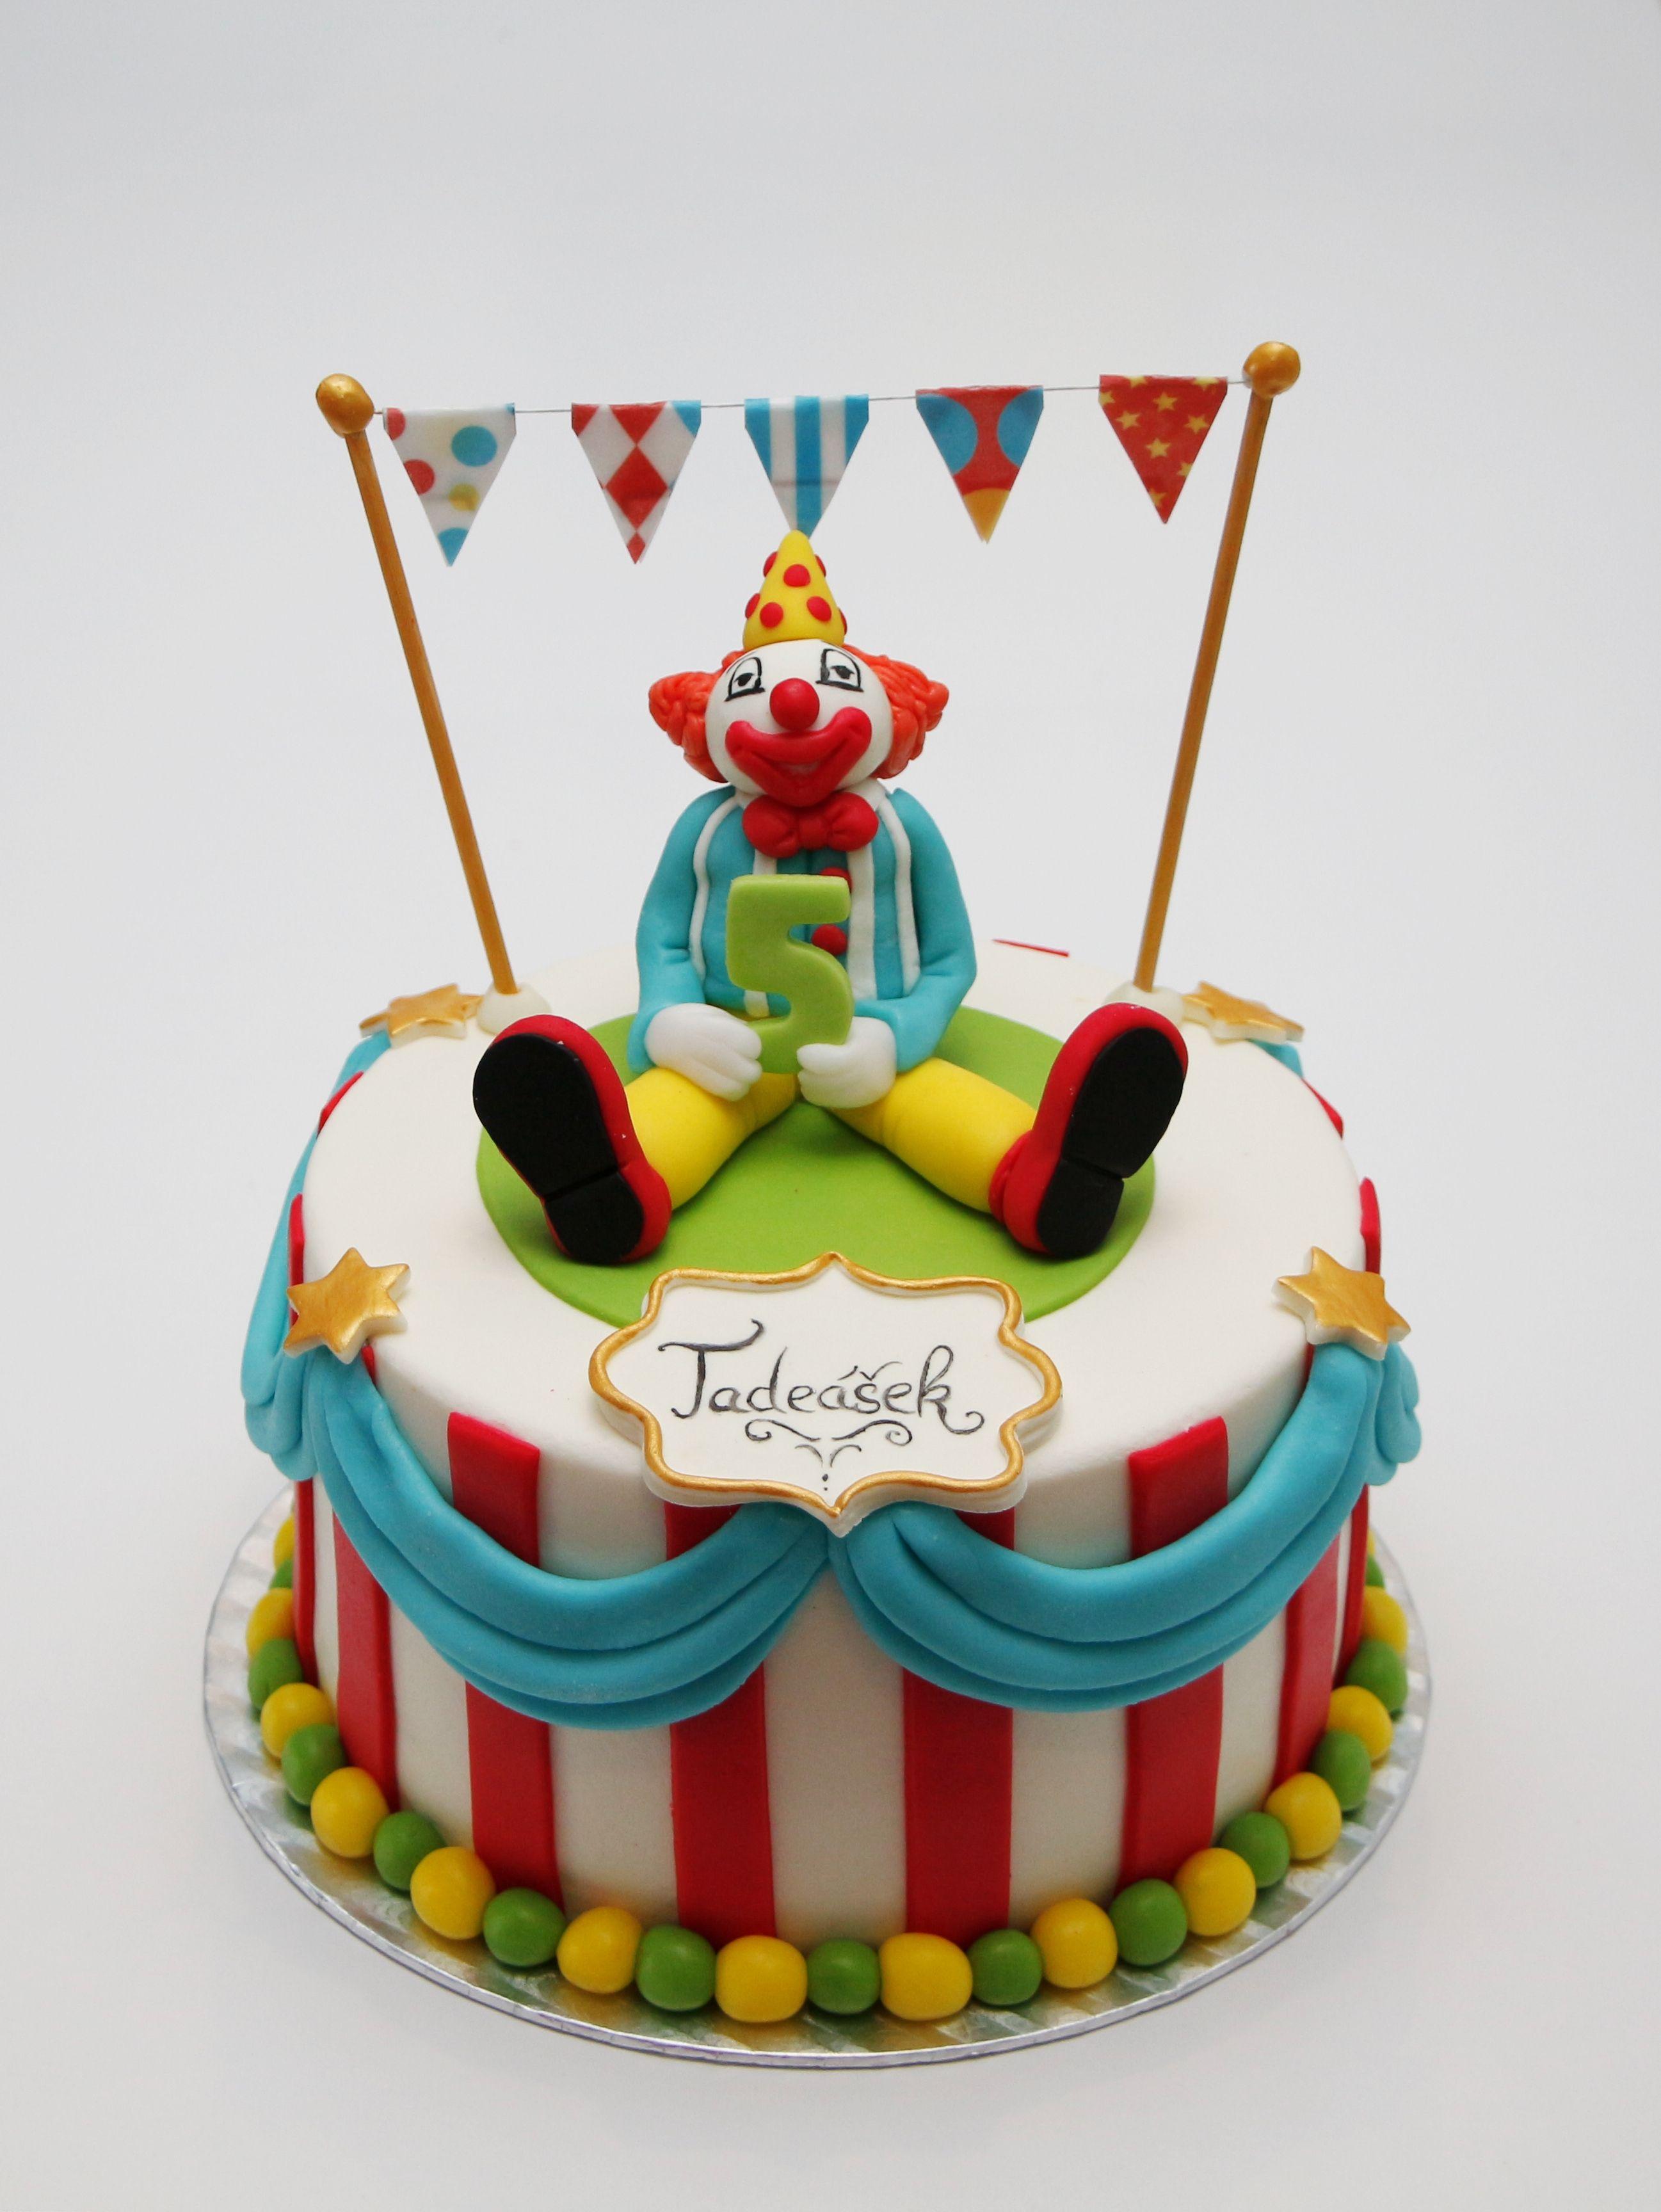 Clown Cake Aa Luxury Cakes Pinterest Clown Cake Cake And